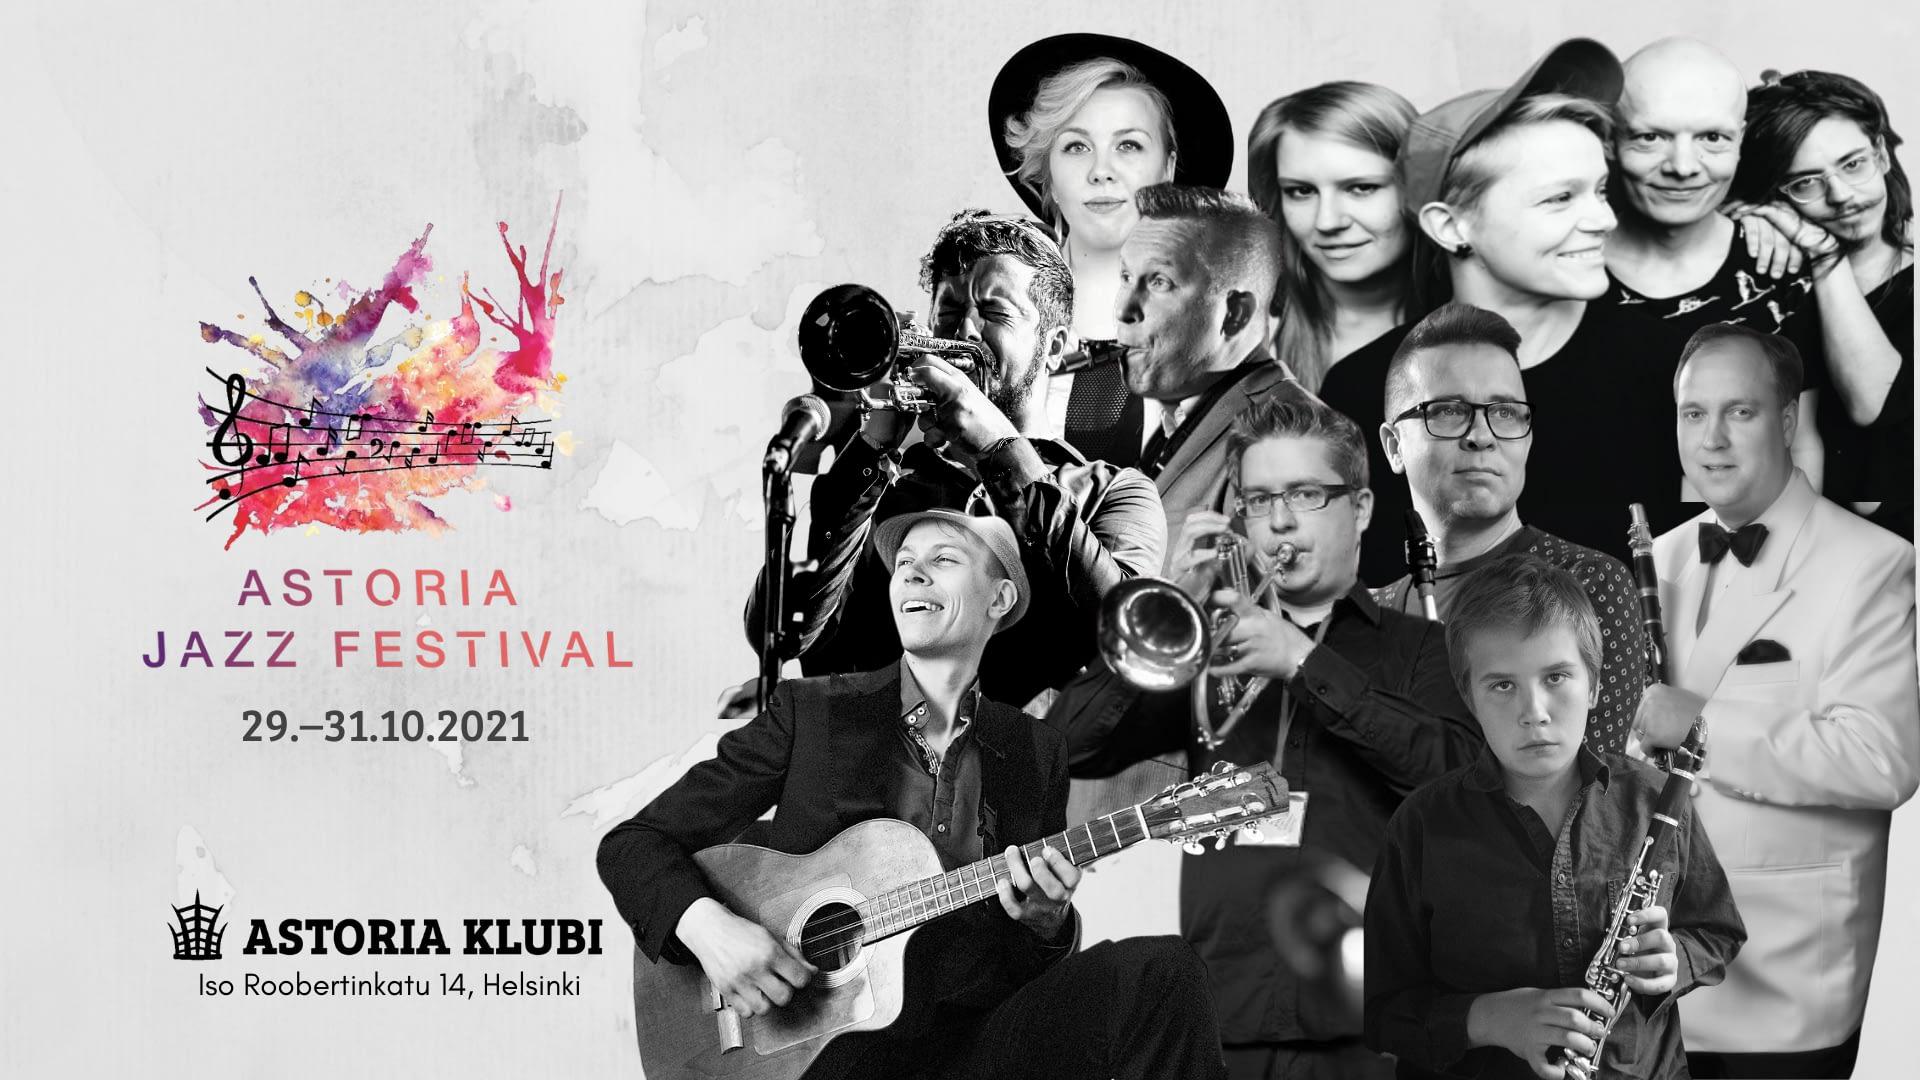 Astoria Jazz Festival 2021